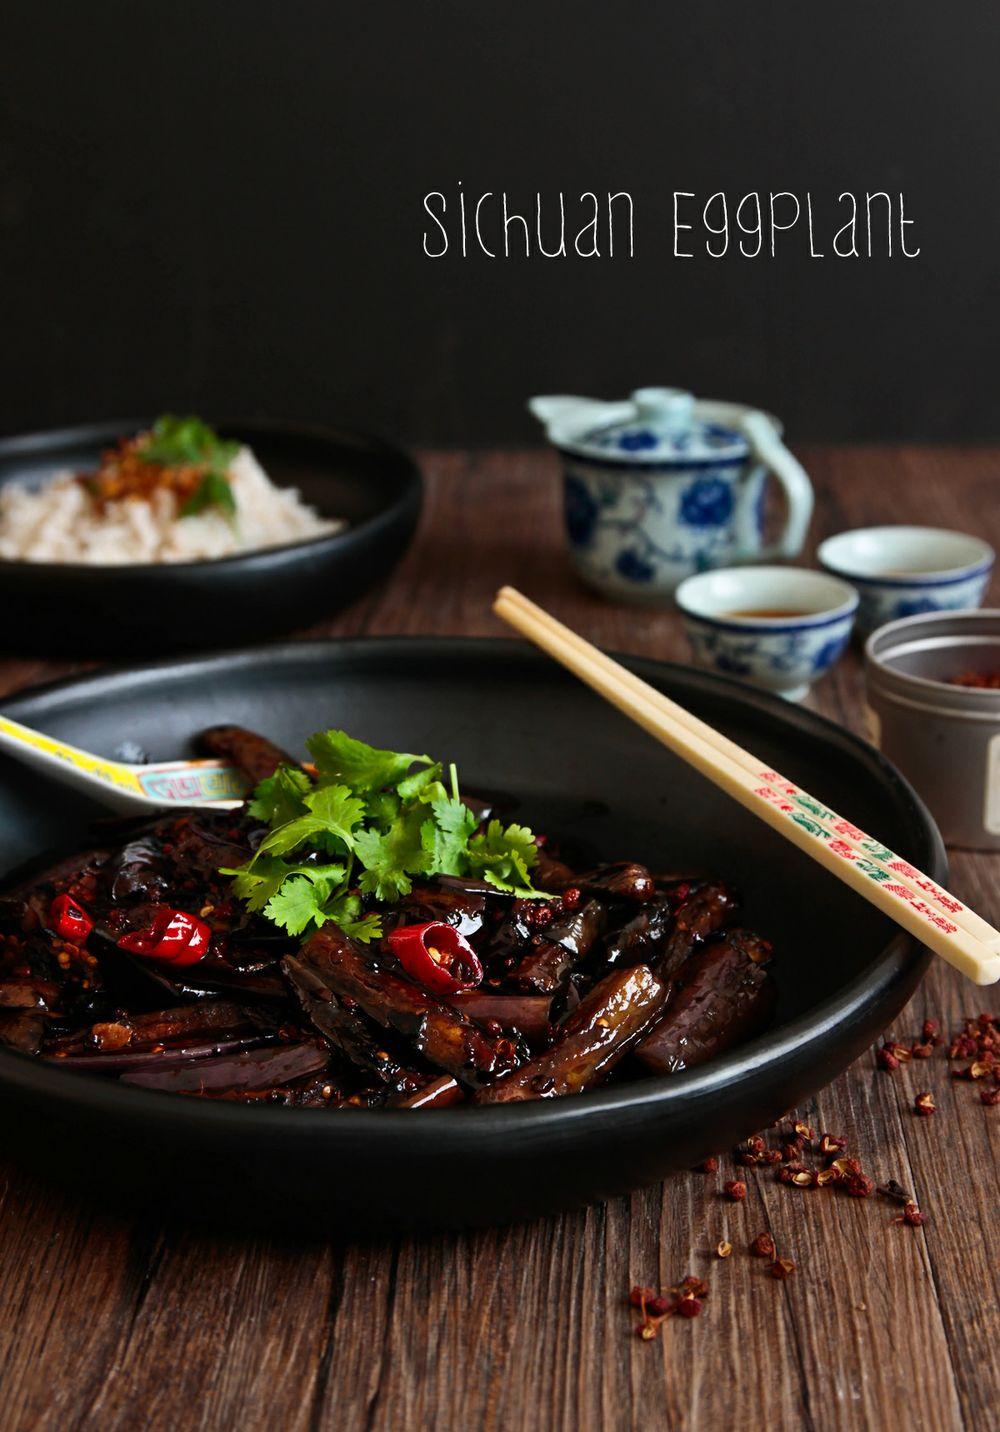 m-sichuan-eggplant-2-3